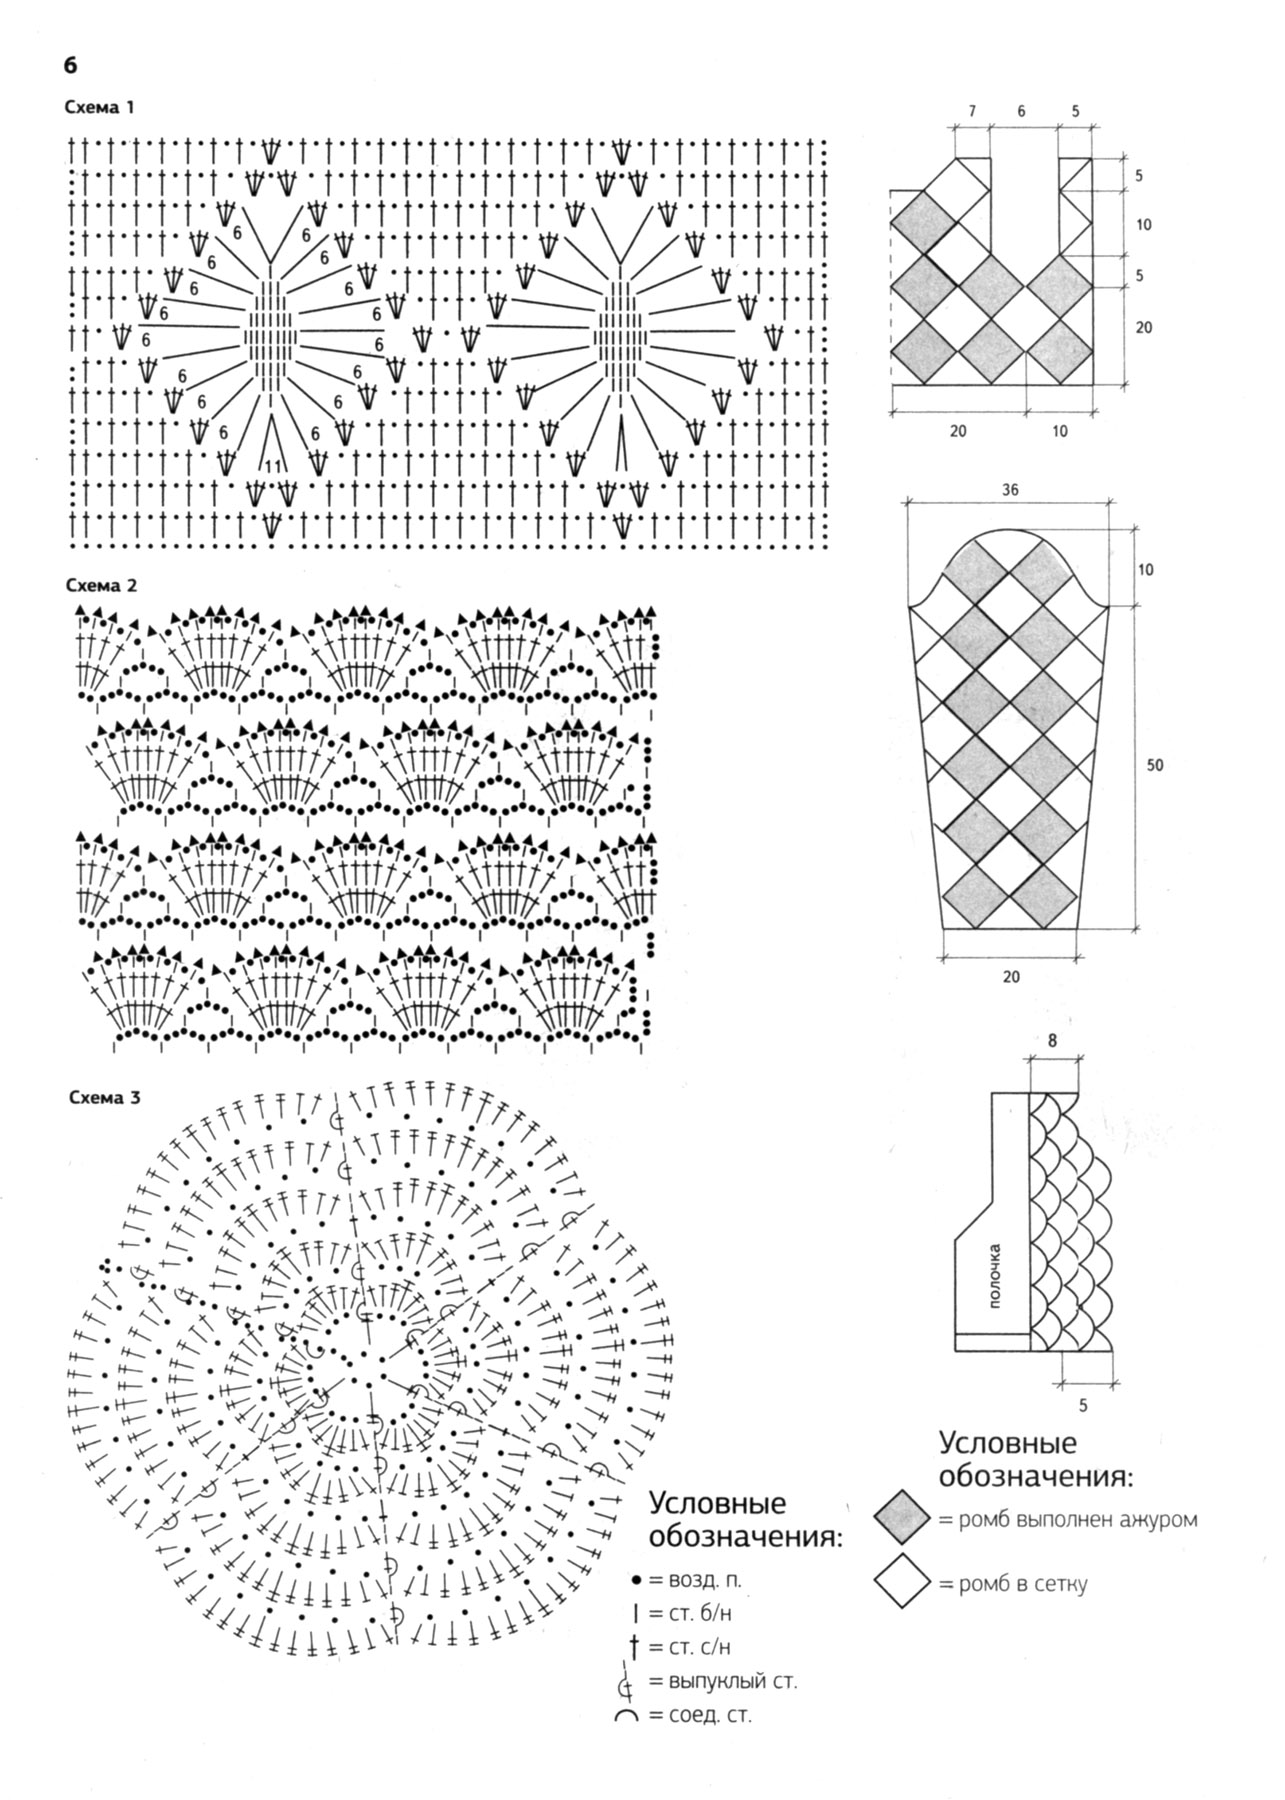 Crochet Patterns Printable : PRINTABLE CROCHET PATTERNS - Easy Crochet Patterns